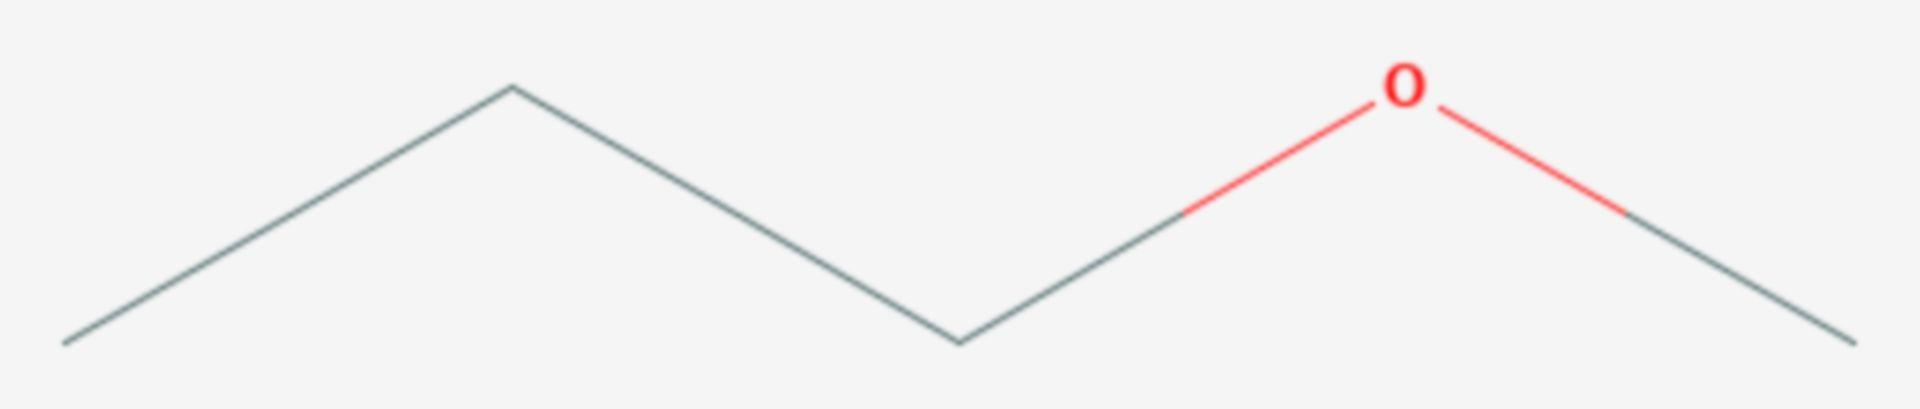 Methyl-n-propylether (Strukturformel)